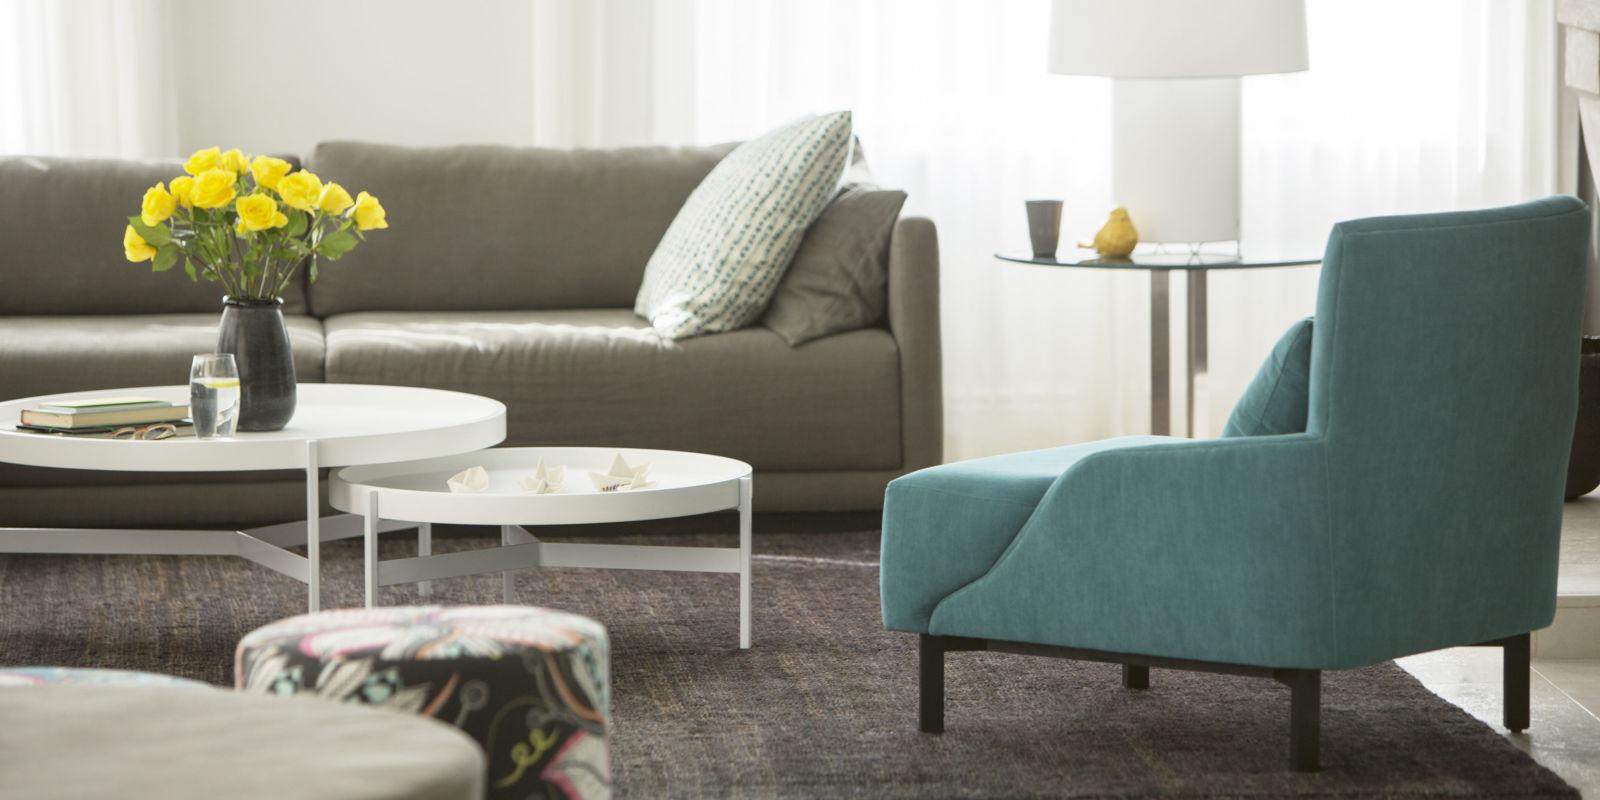 How To Arrange Living Room